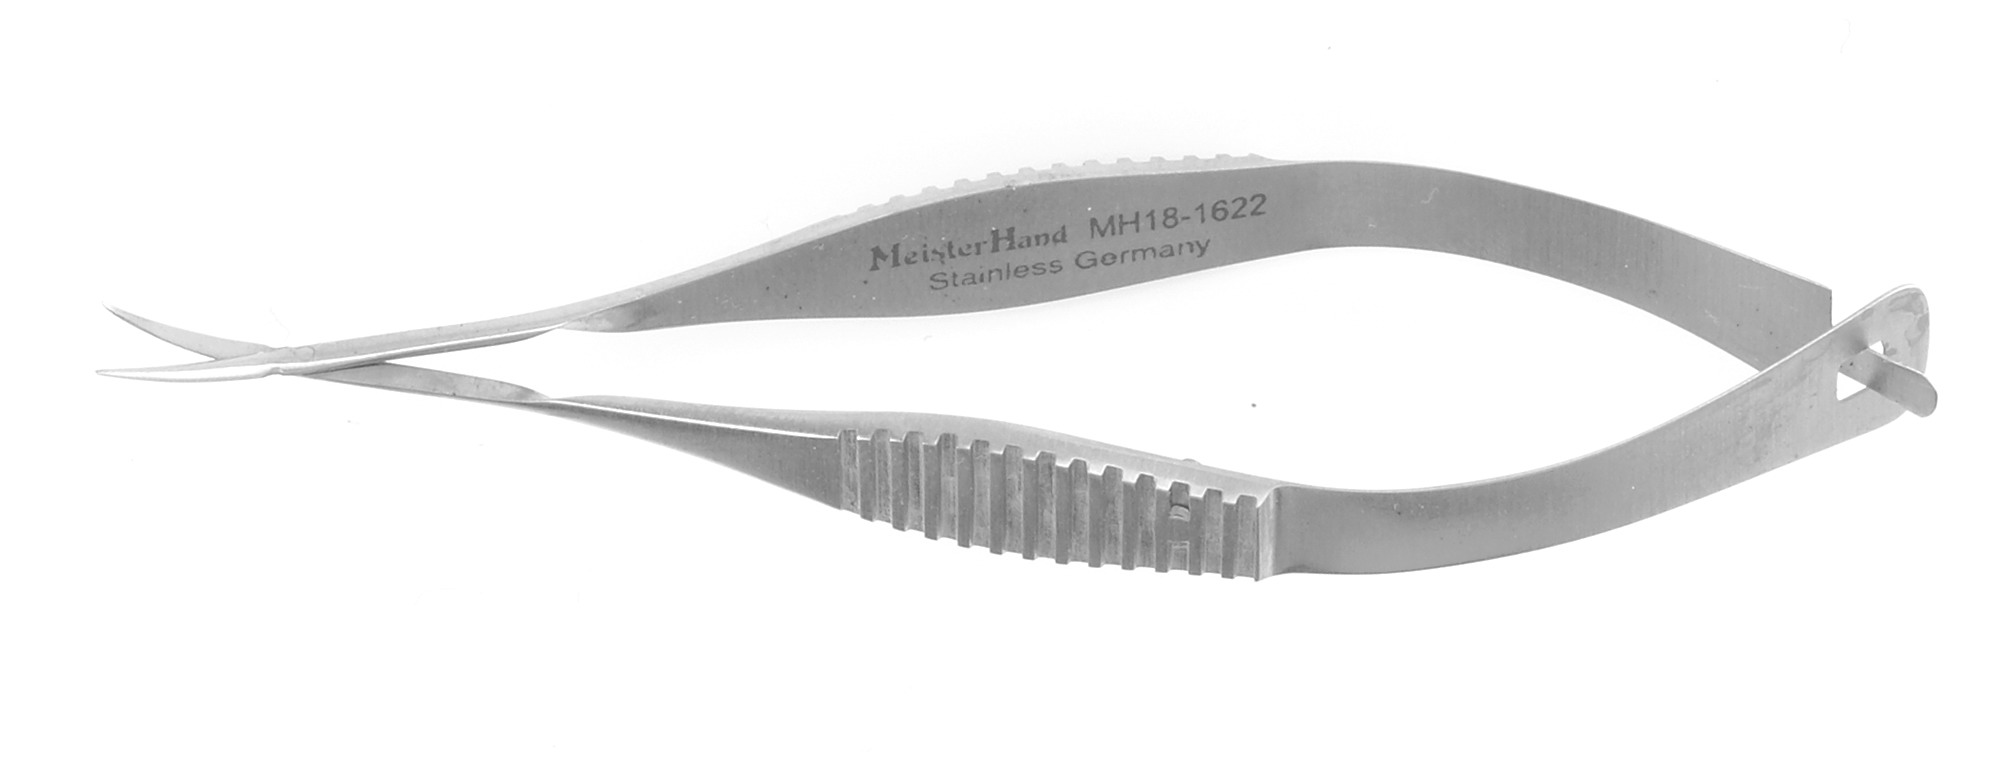 mh-vannas-scs-3-1-4-cvd-mh18-1622-miltex.jpg